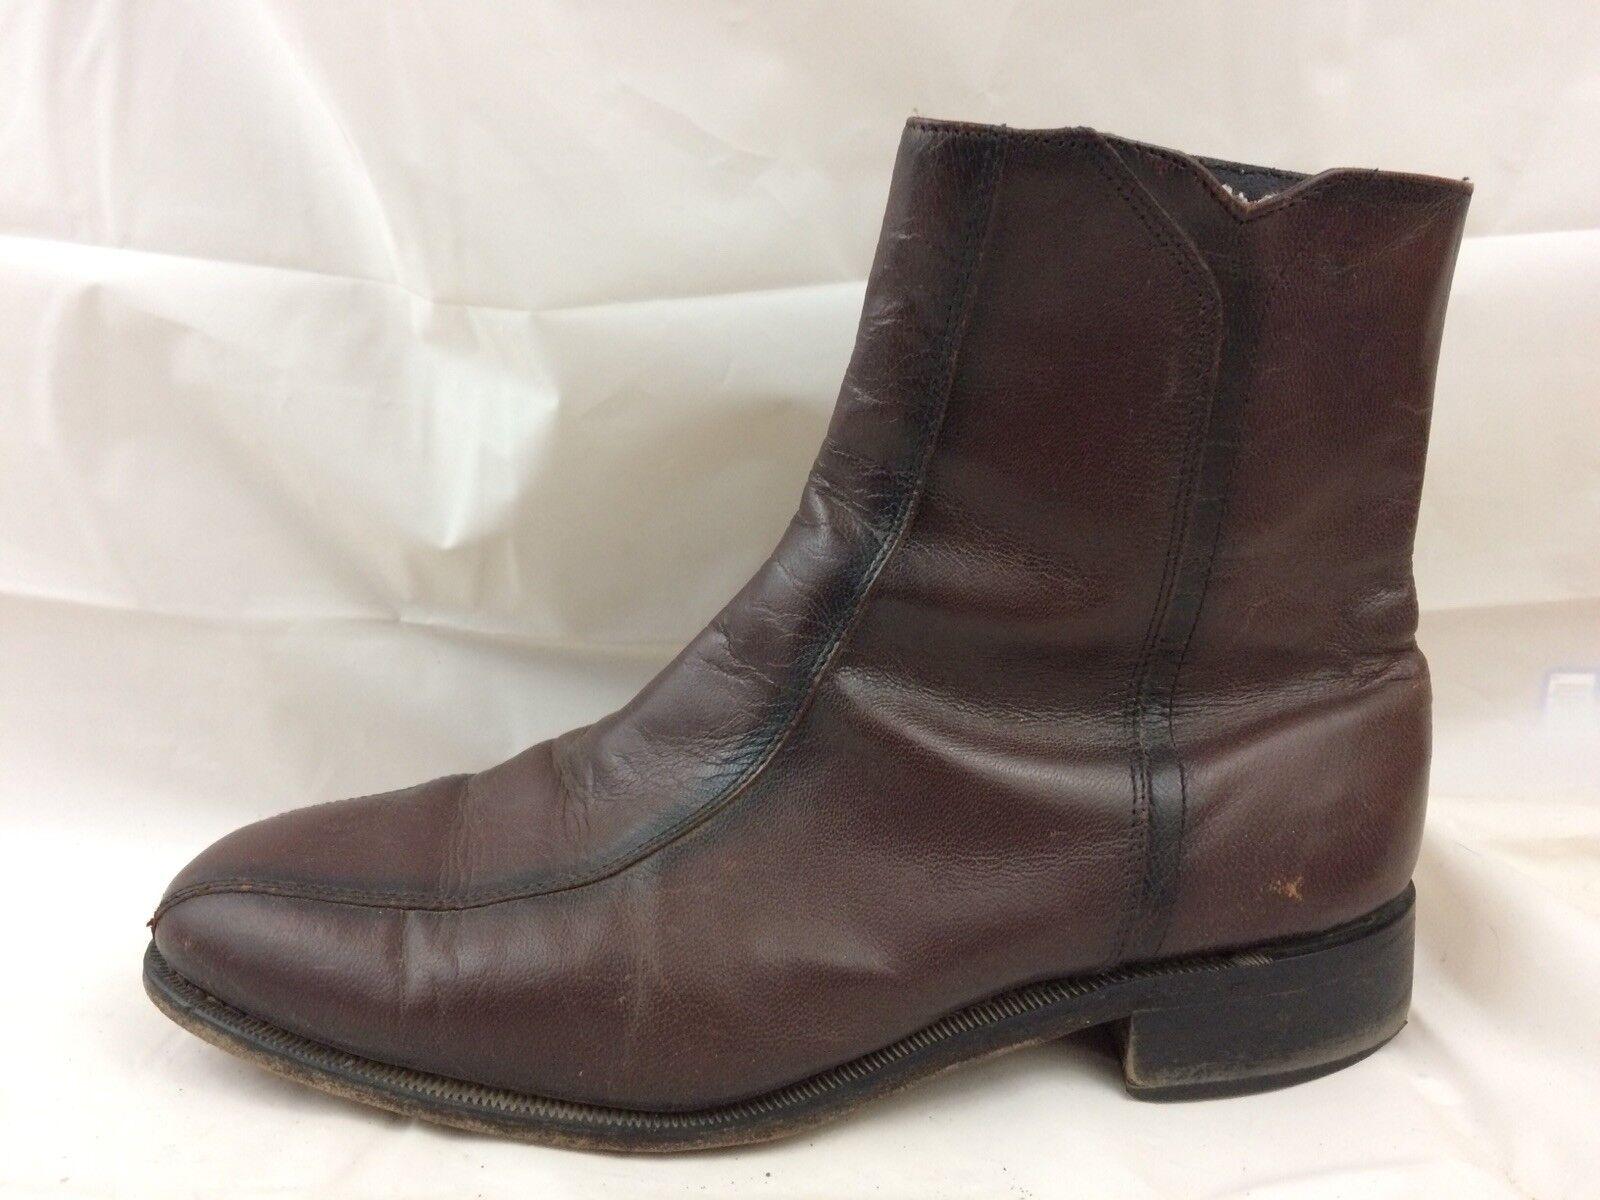 Florsheim braun Burgundy Leather Ankle Zip Stiefel Mens 9.5 EEE Extra WIDE 11087